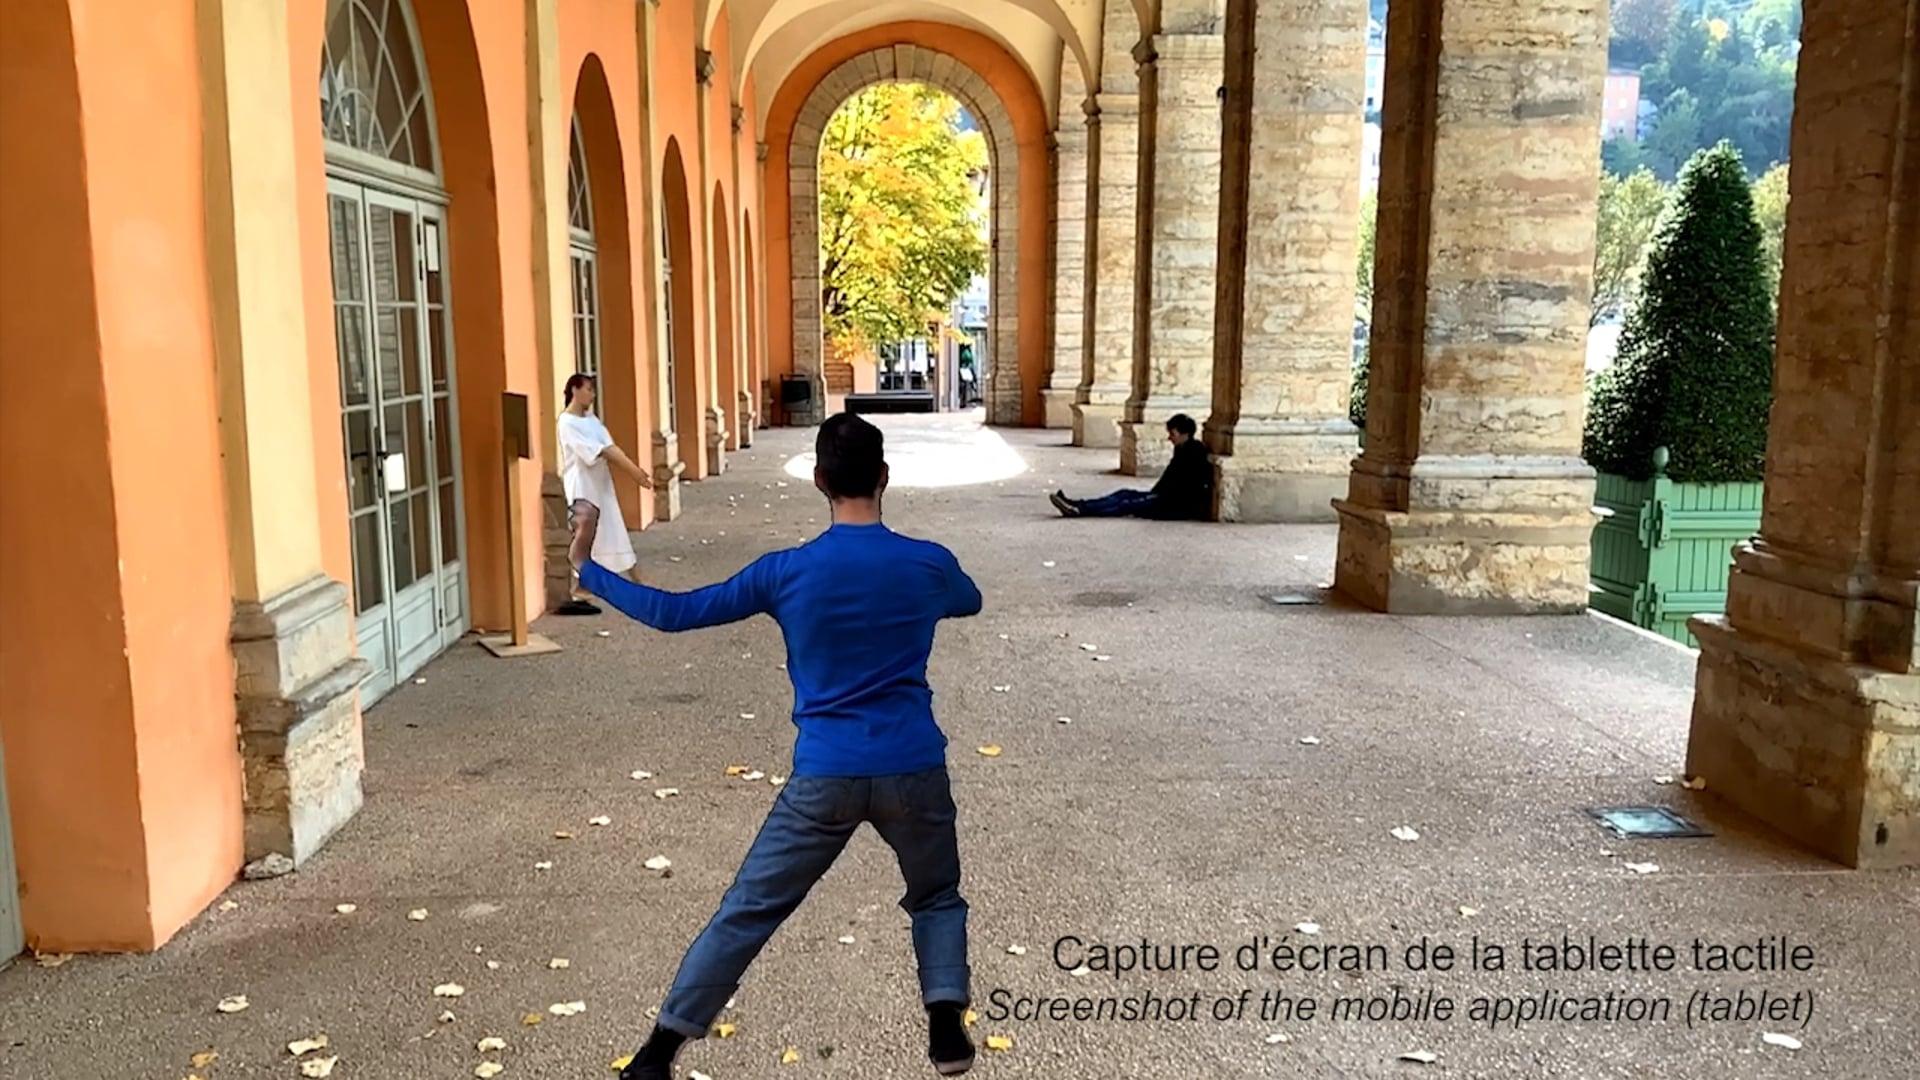 Natacha Paquignon - Space Dances - novembre 2019 #2 - Les Subsistances, Lyon